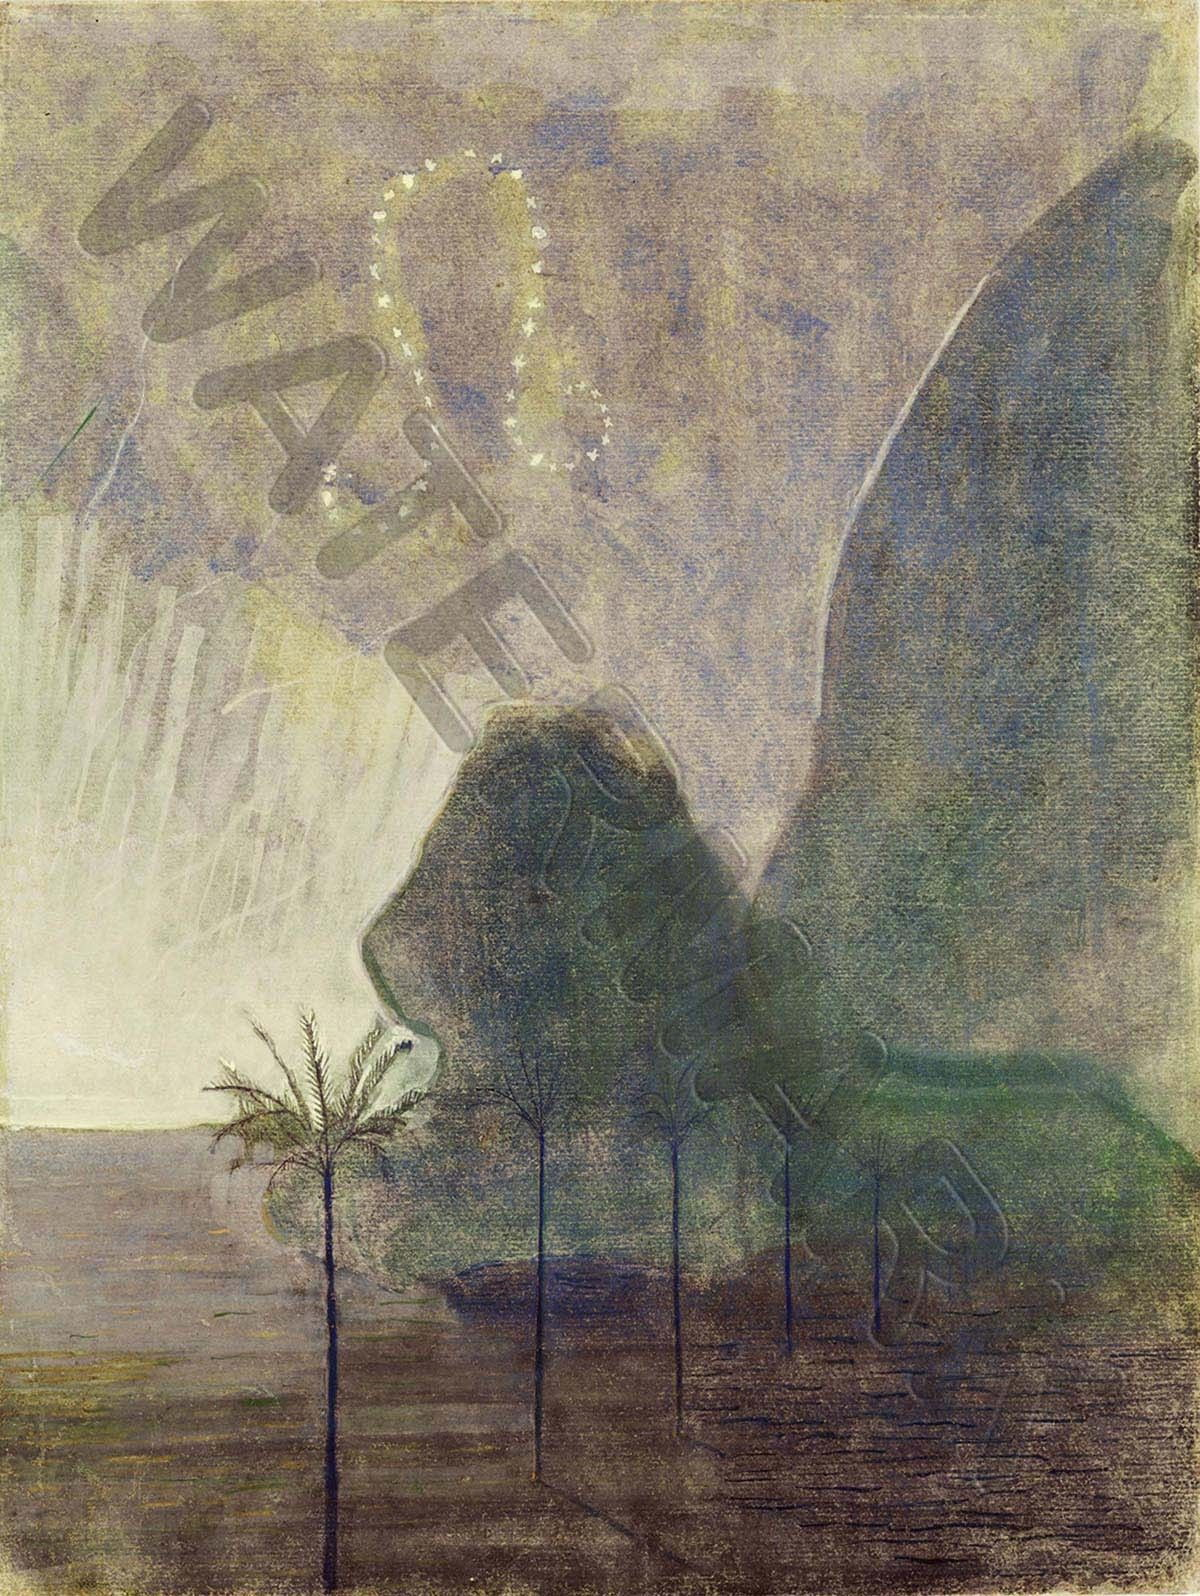 87598 Ciurlionis Sun Passing Leo Decor WALL PRINT POSTER CA